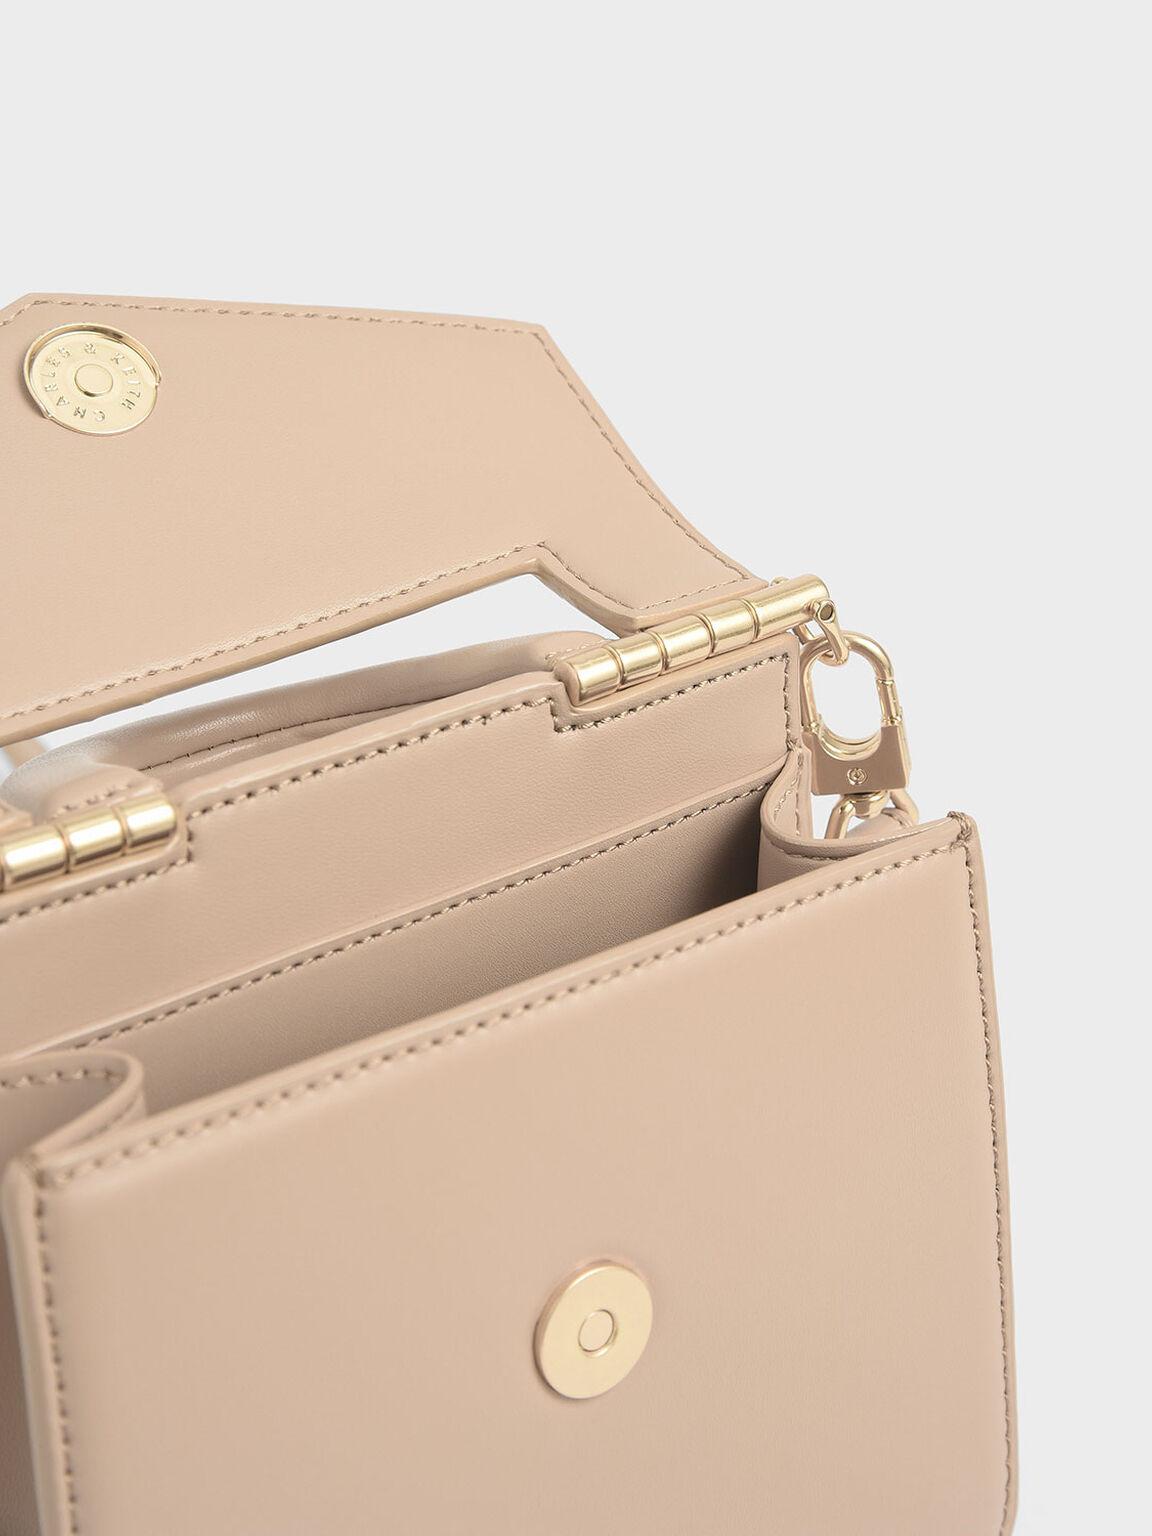 Mini Envelope Bag, Beige, hi-res